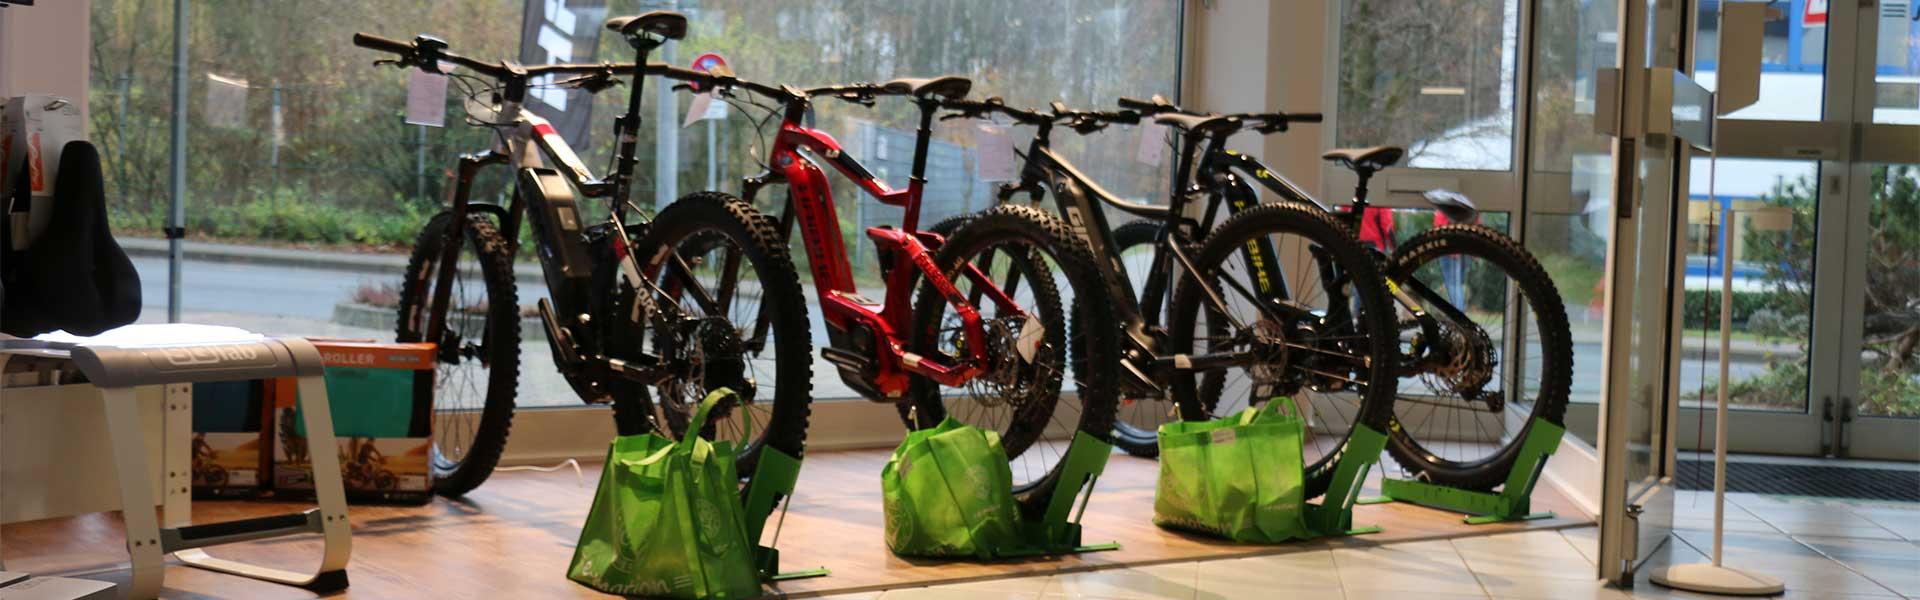 Der Shop der e-motion e-Bike Welt Nordheide